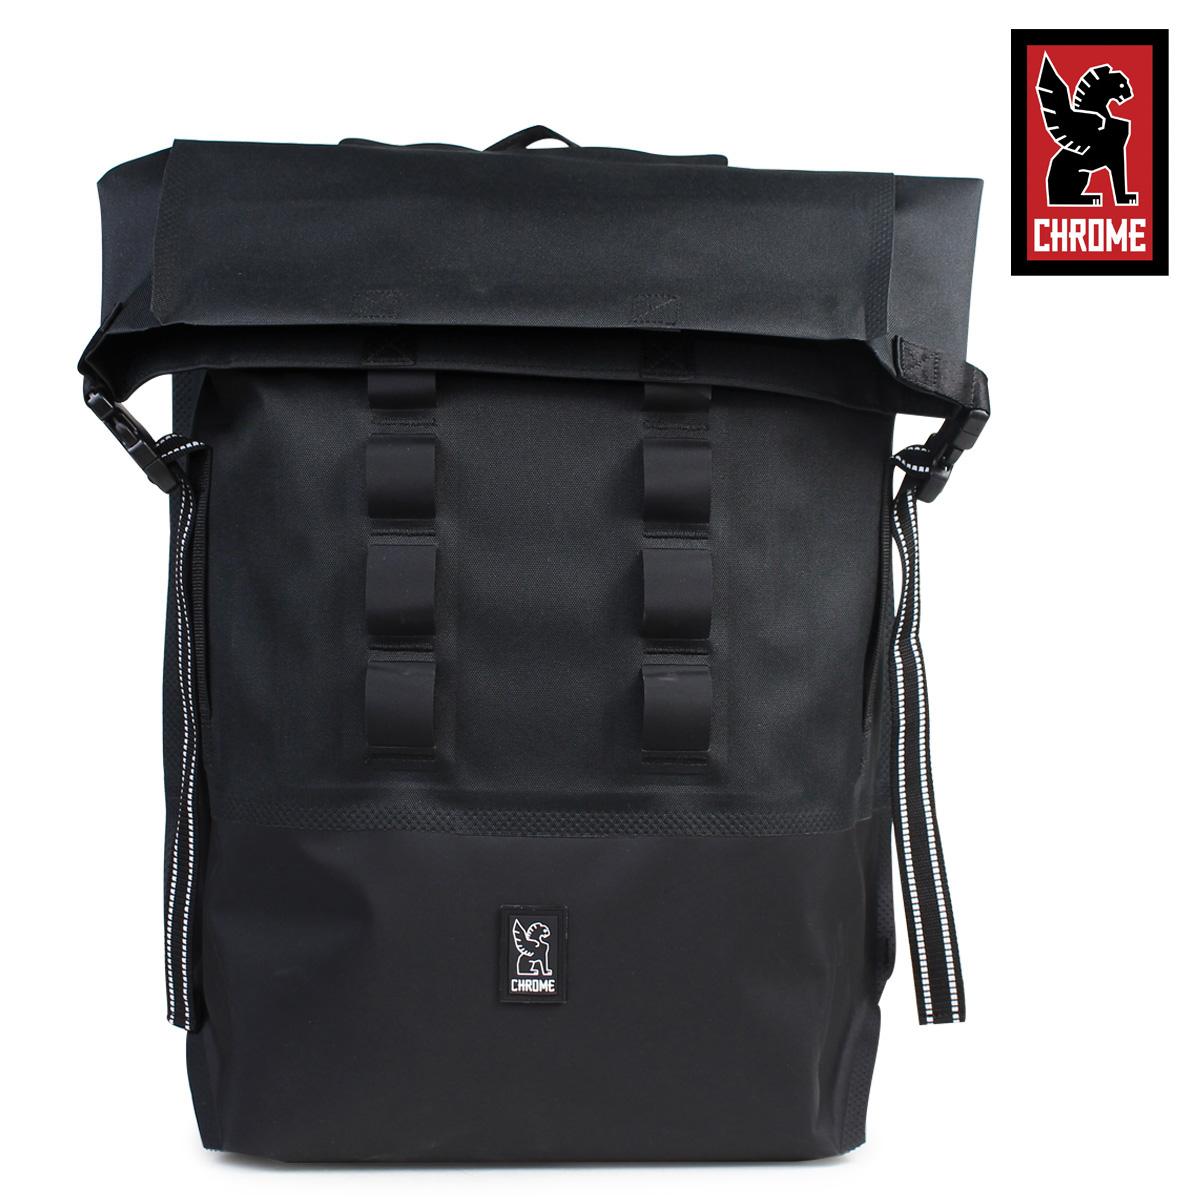 【SOLD OUT】 CHROME URBAN EX ROLLTOP リュック バッグクローム バックパック 28L メンズ レディース BG-218 ブラック